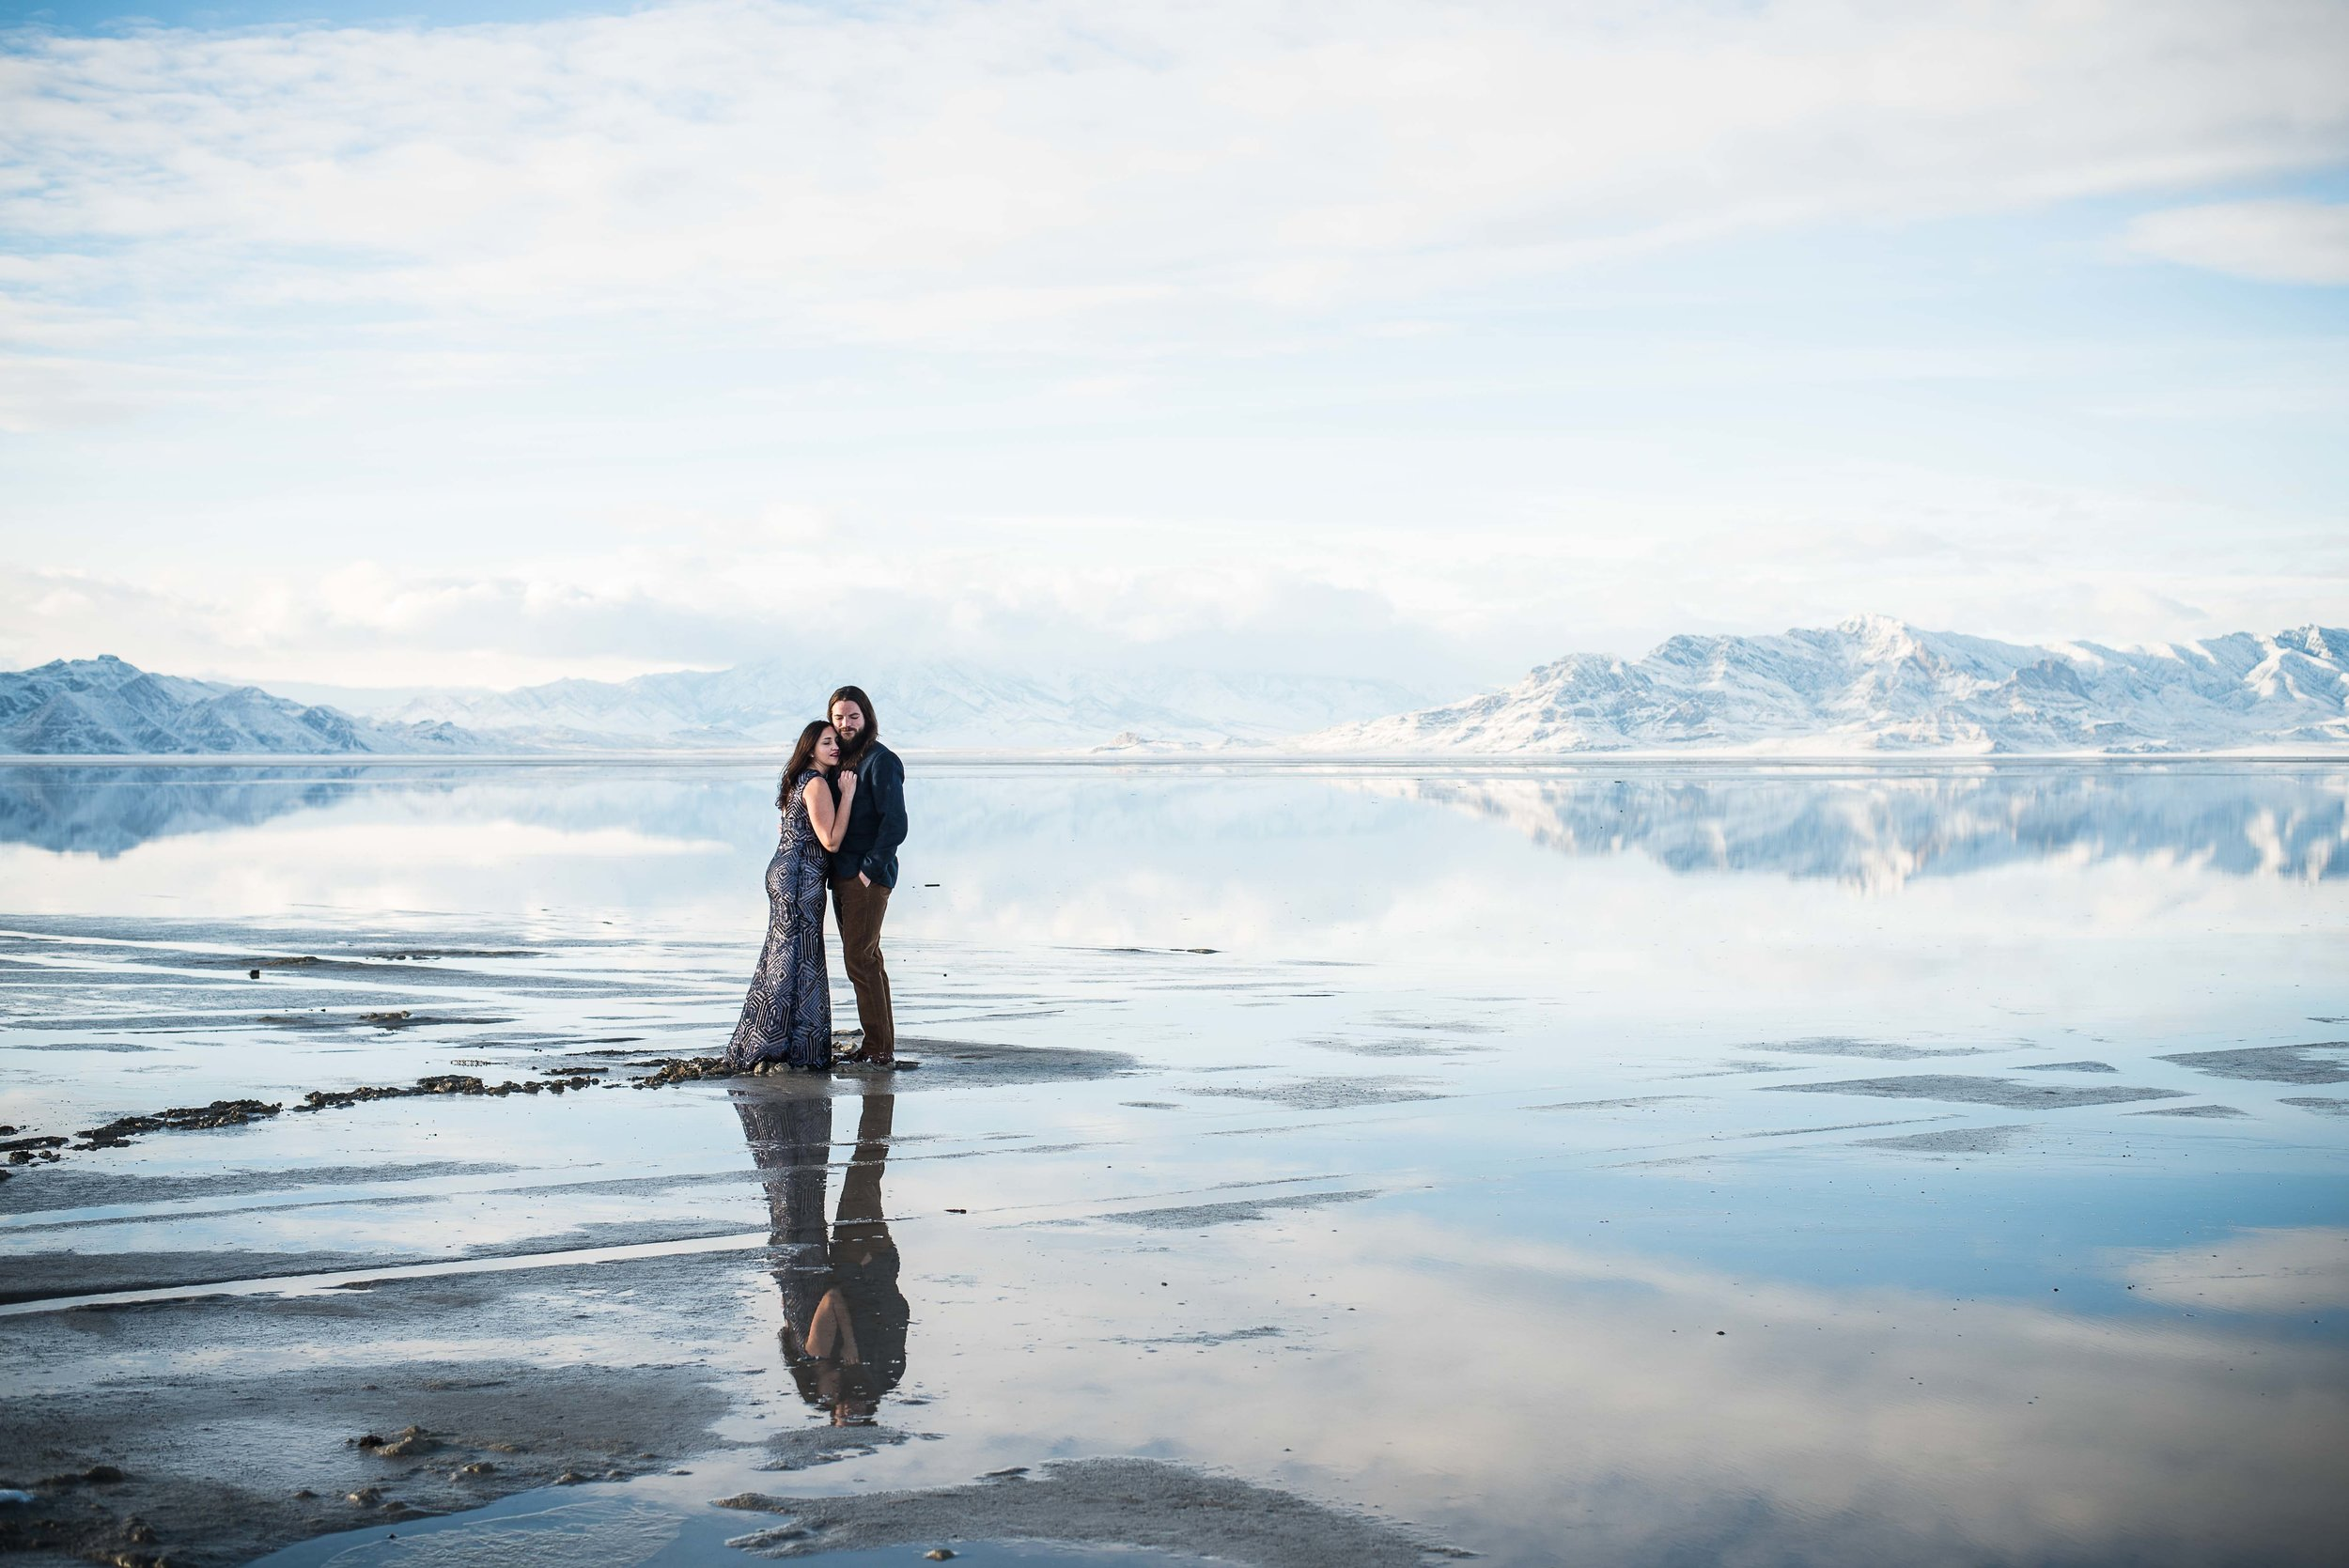 Ciara+Micah-Engagements-Sadie-Banks-Photography-79.jpg